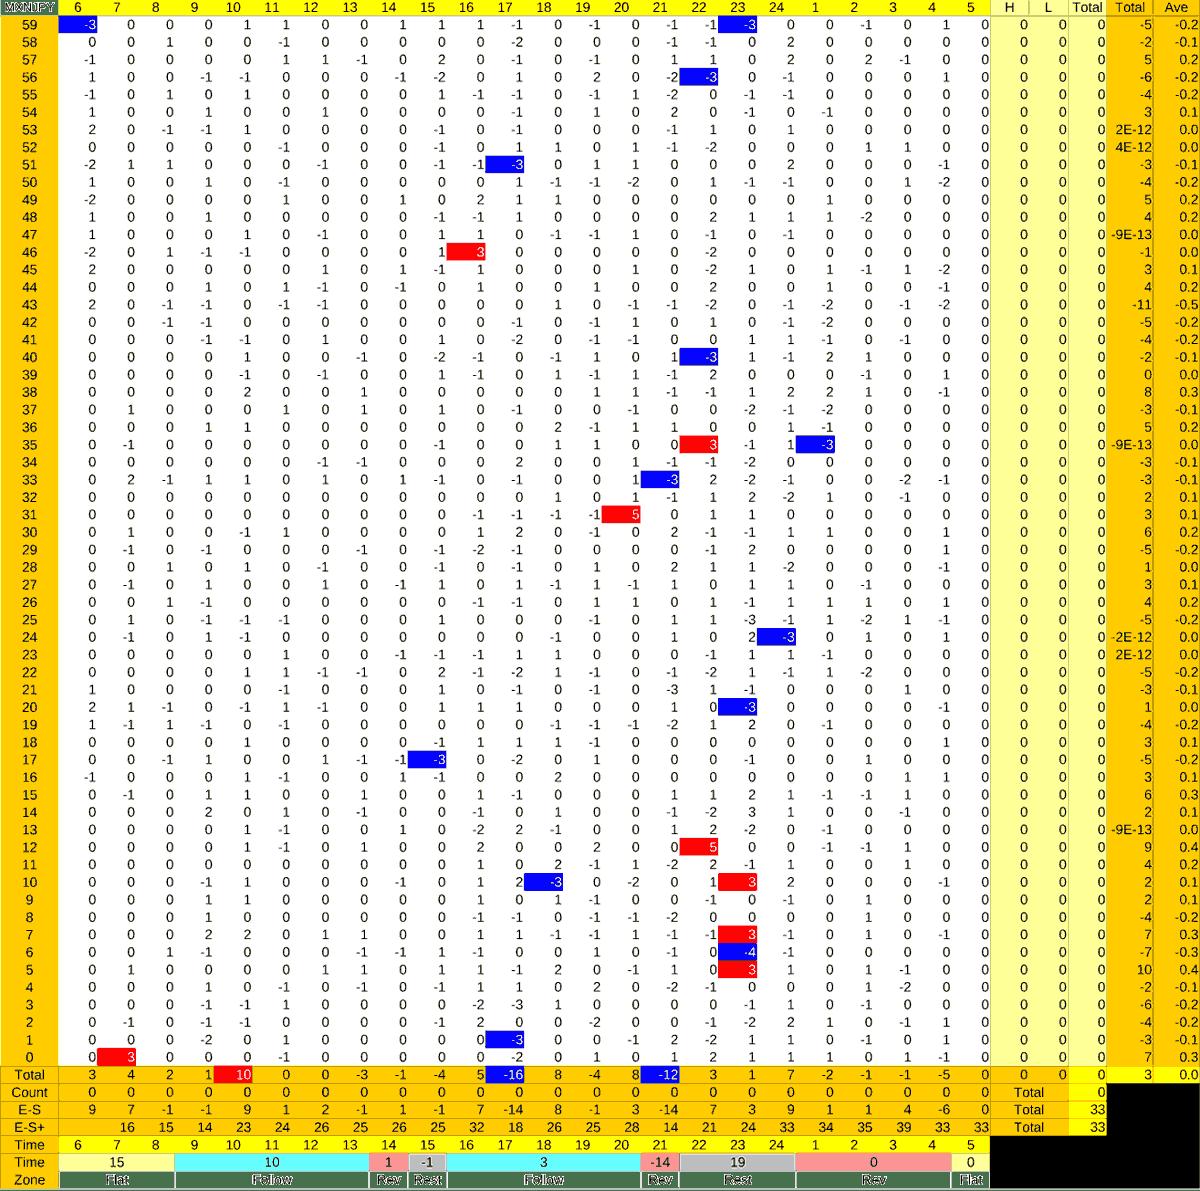 20210423_HS(3)MXNJPY